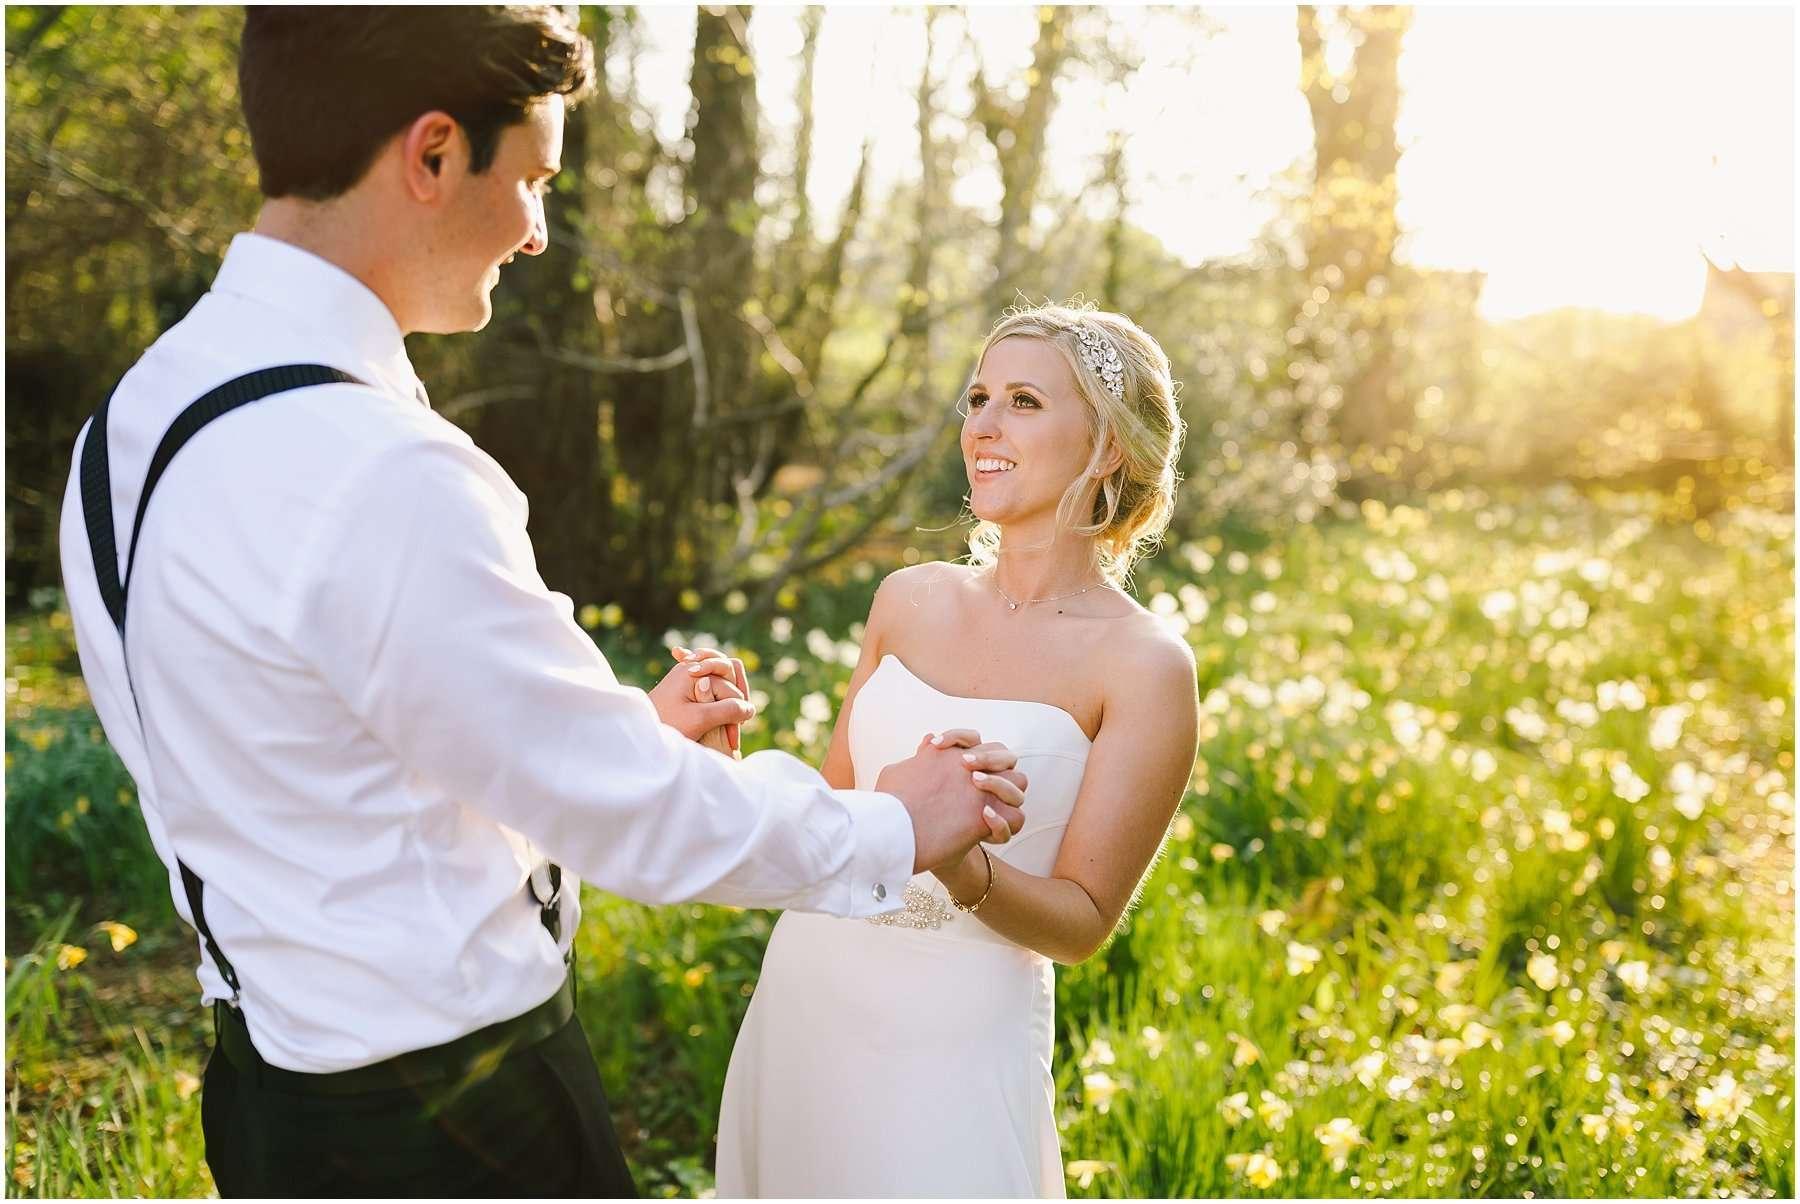 LUCI AND OLLIE VOEWOOD WEDDING - NORWICH WEDDING PHOTOGRAPHER 1